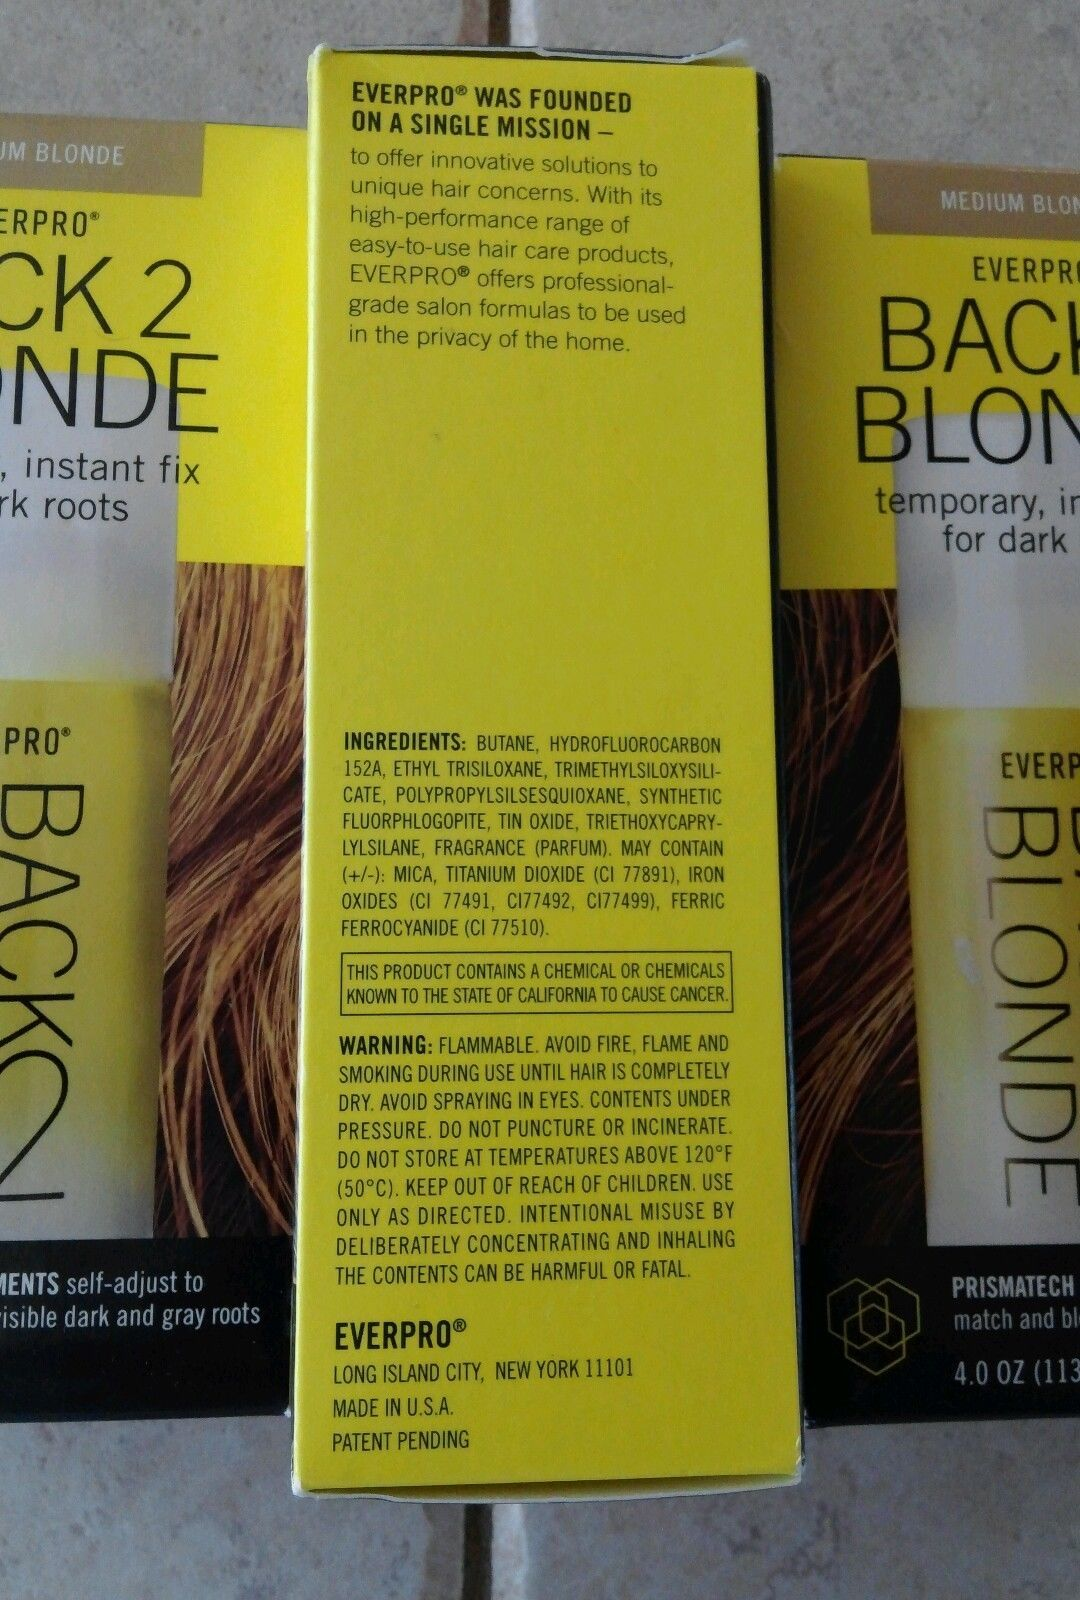 Everpro Back 2 Blonde Medium Blonde and similar items